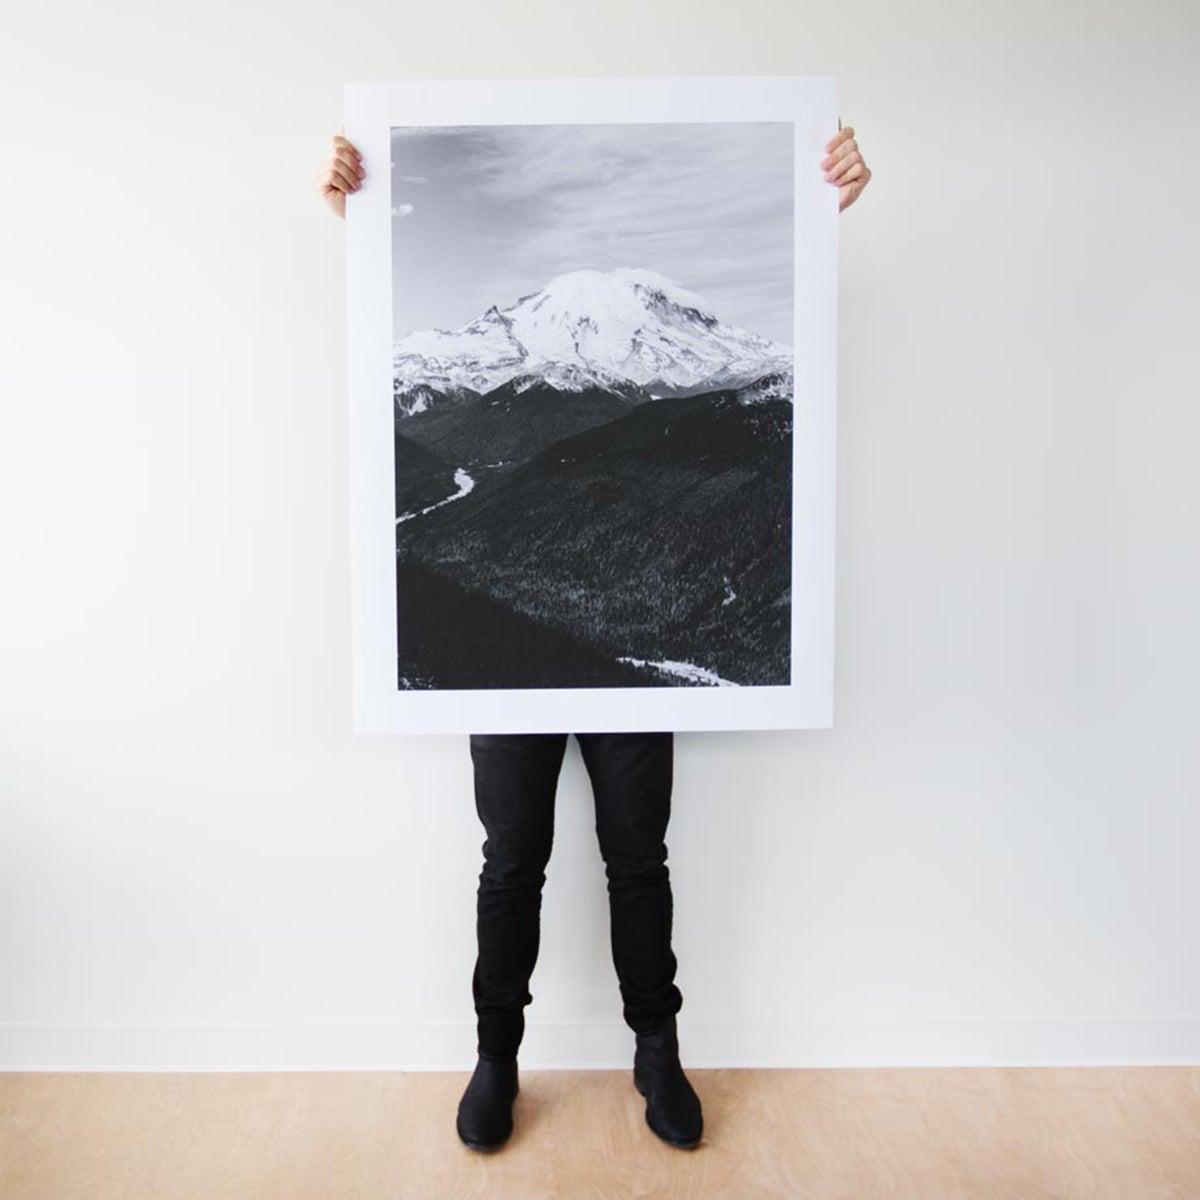 Erasermic large prints